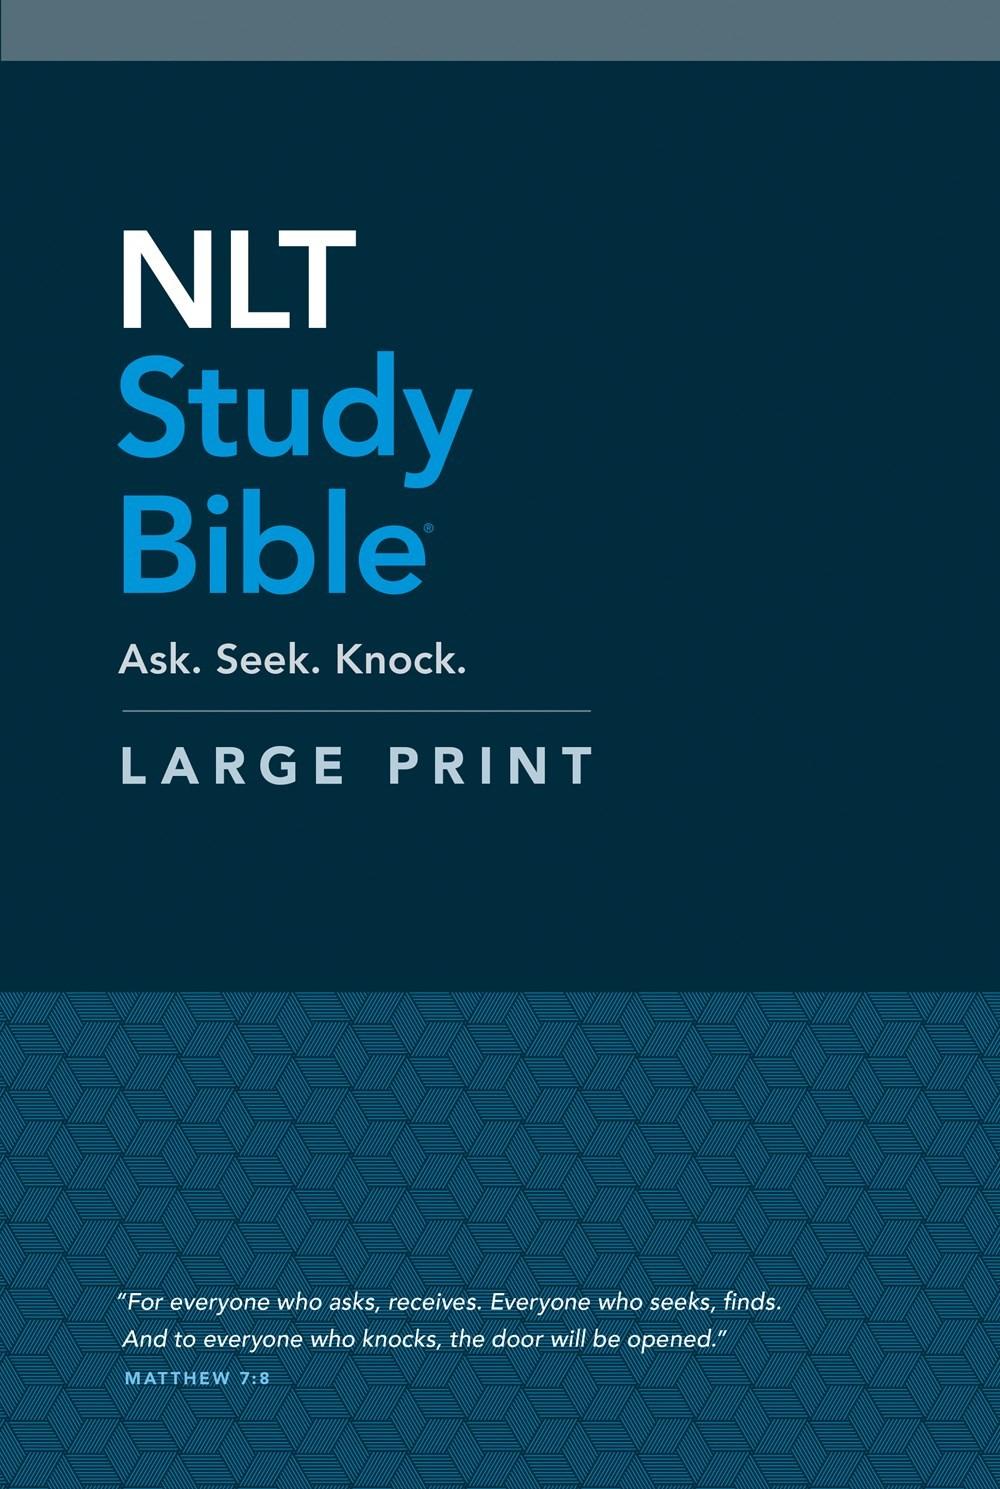 NLT Study Bible/Large Print-Hardcover